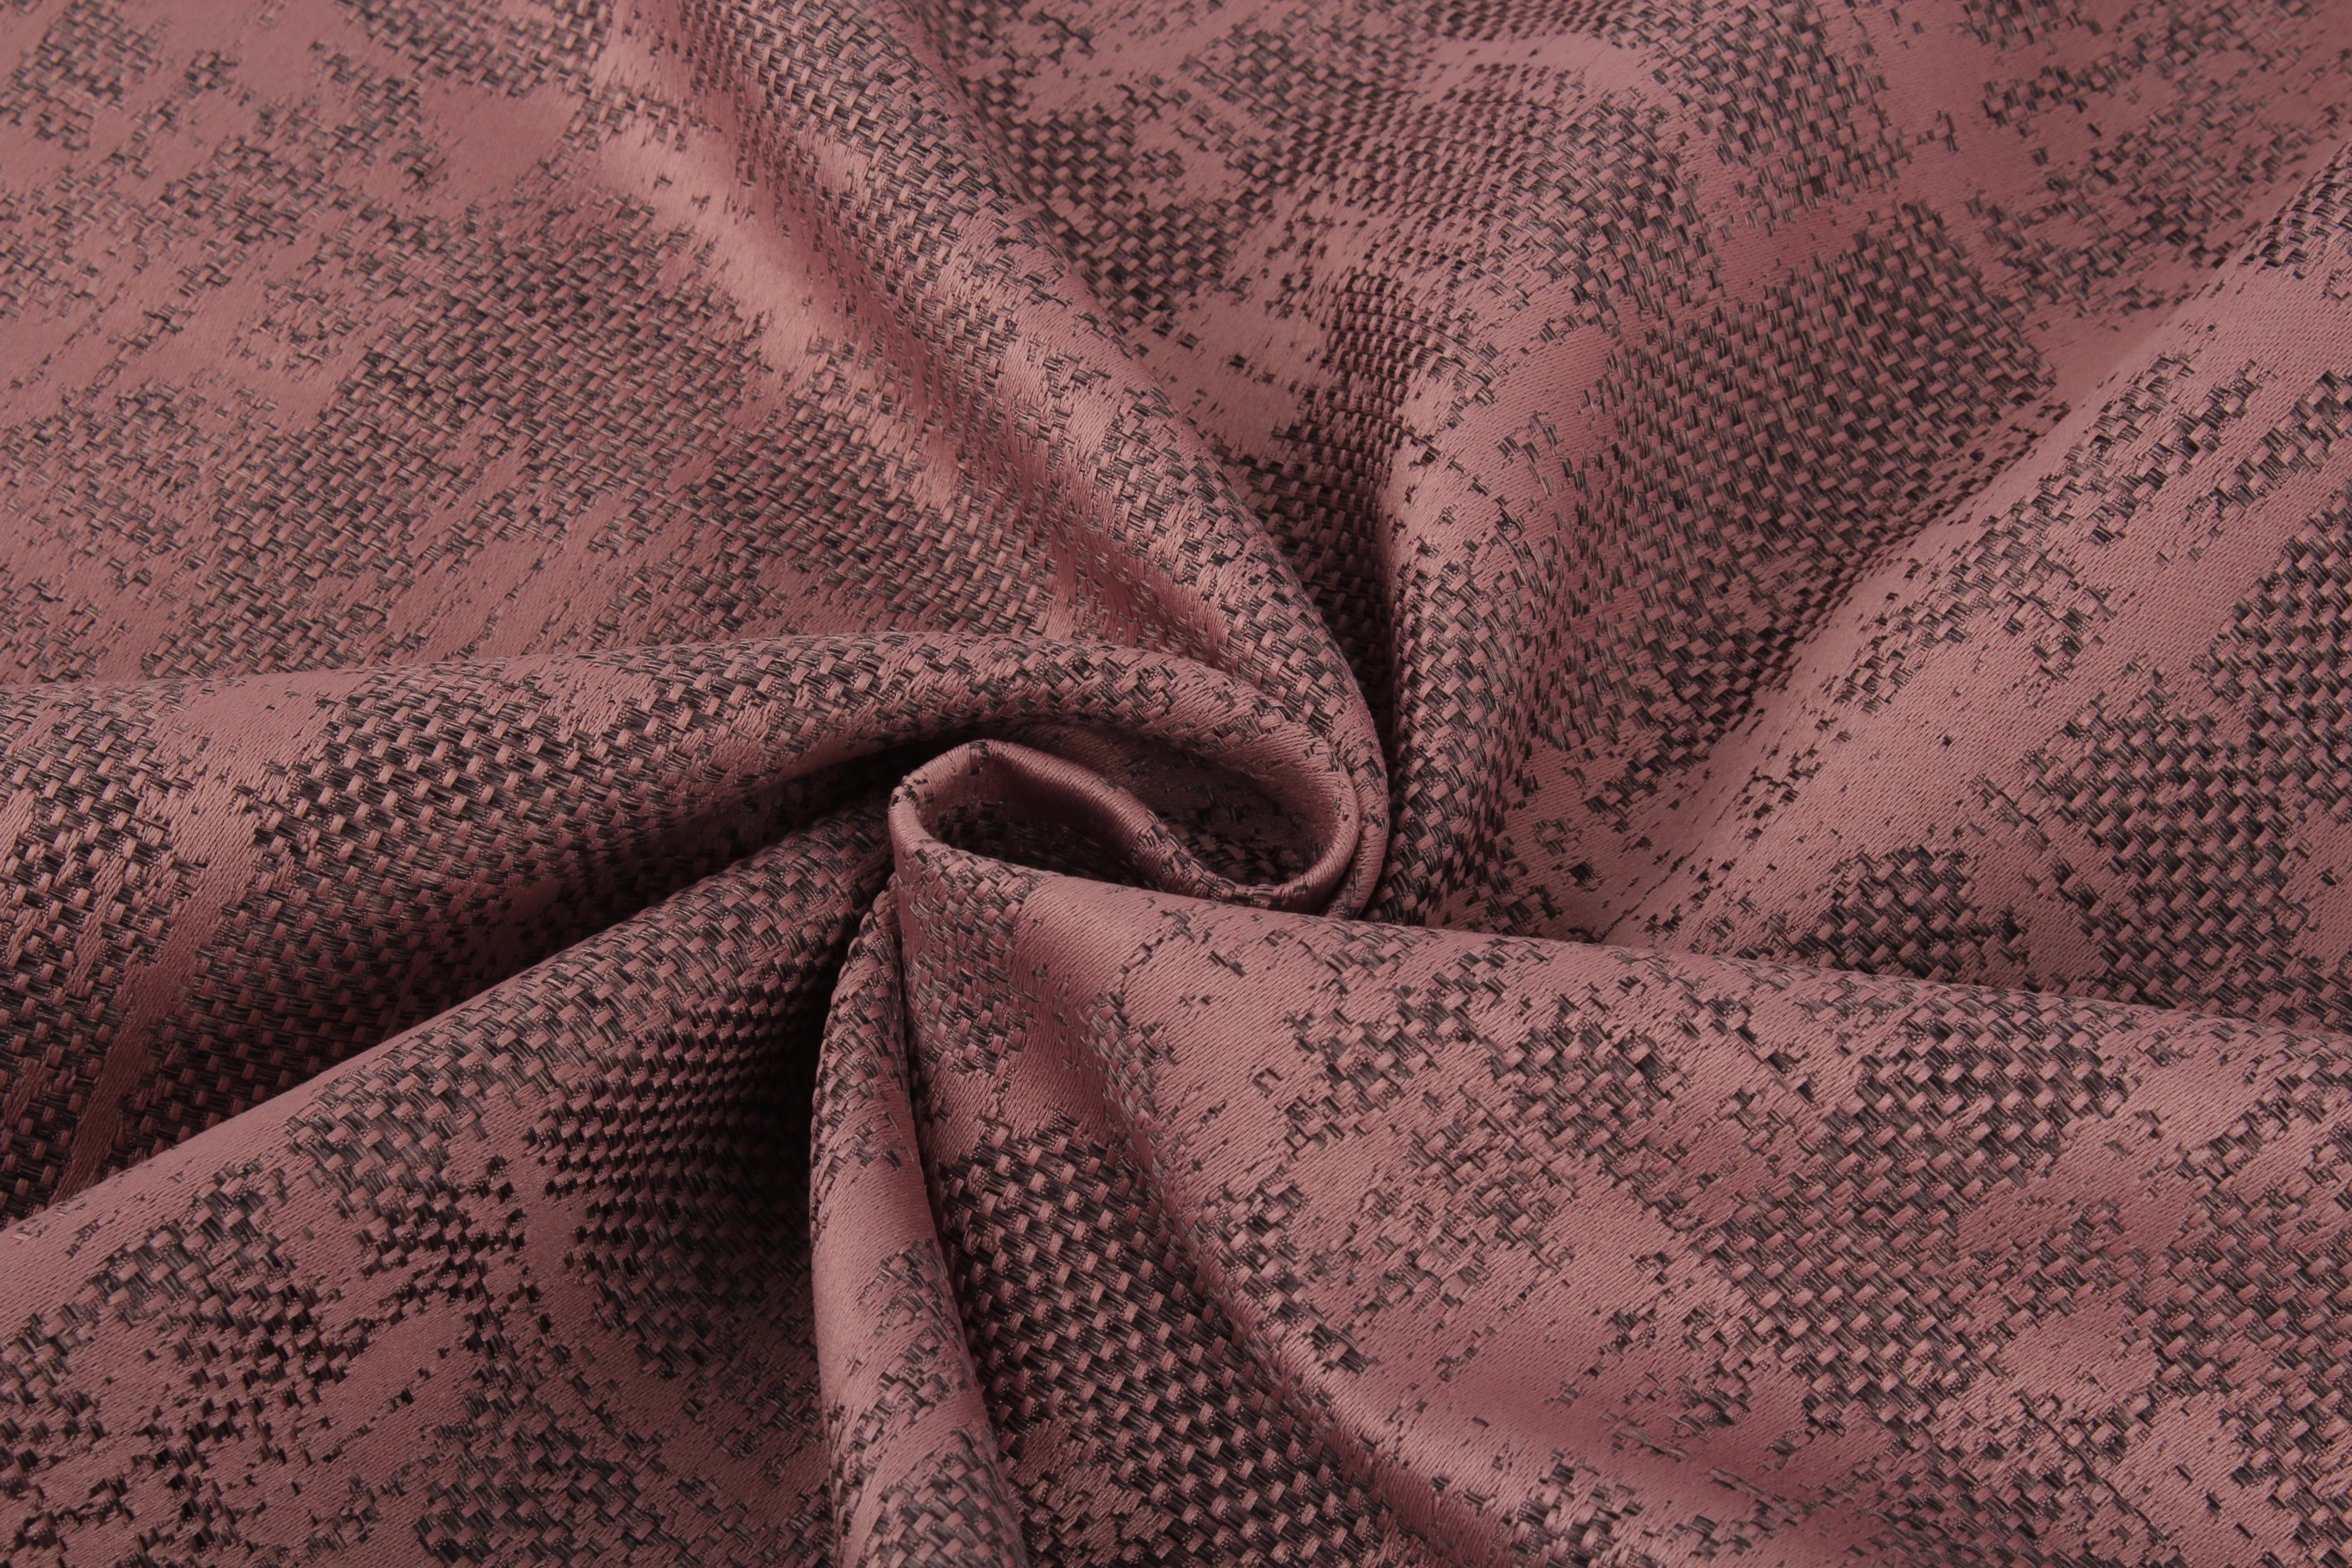 Купить Ткани TexRepublic, Материал Жаккард Japanese Motive Цвет: Брусника, Турция, Бордовый